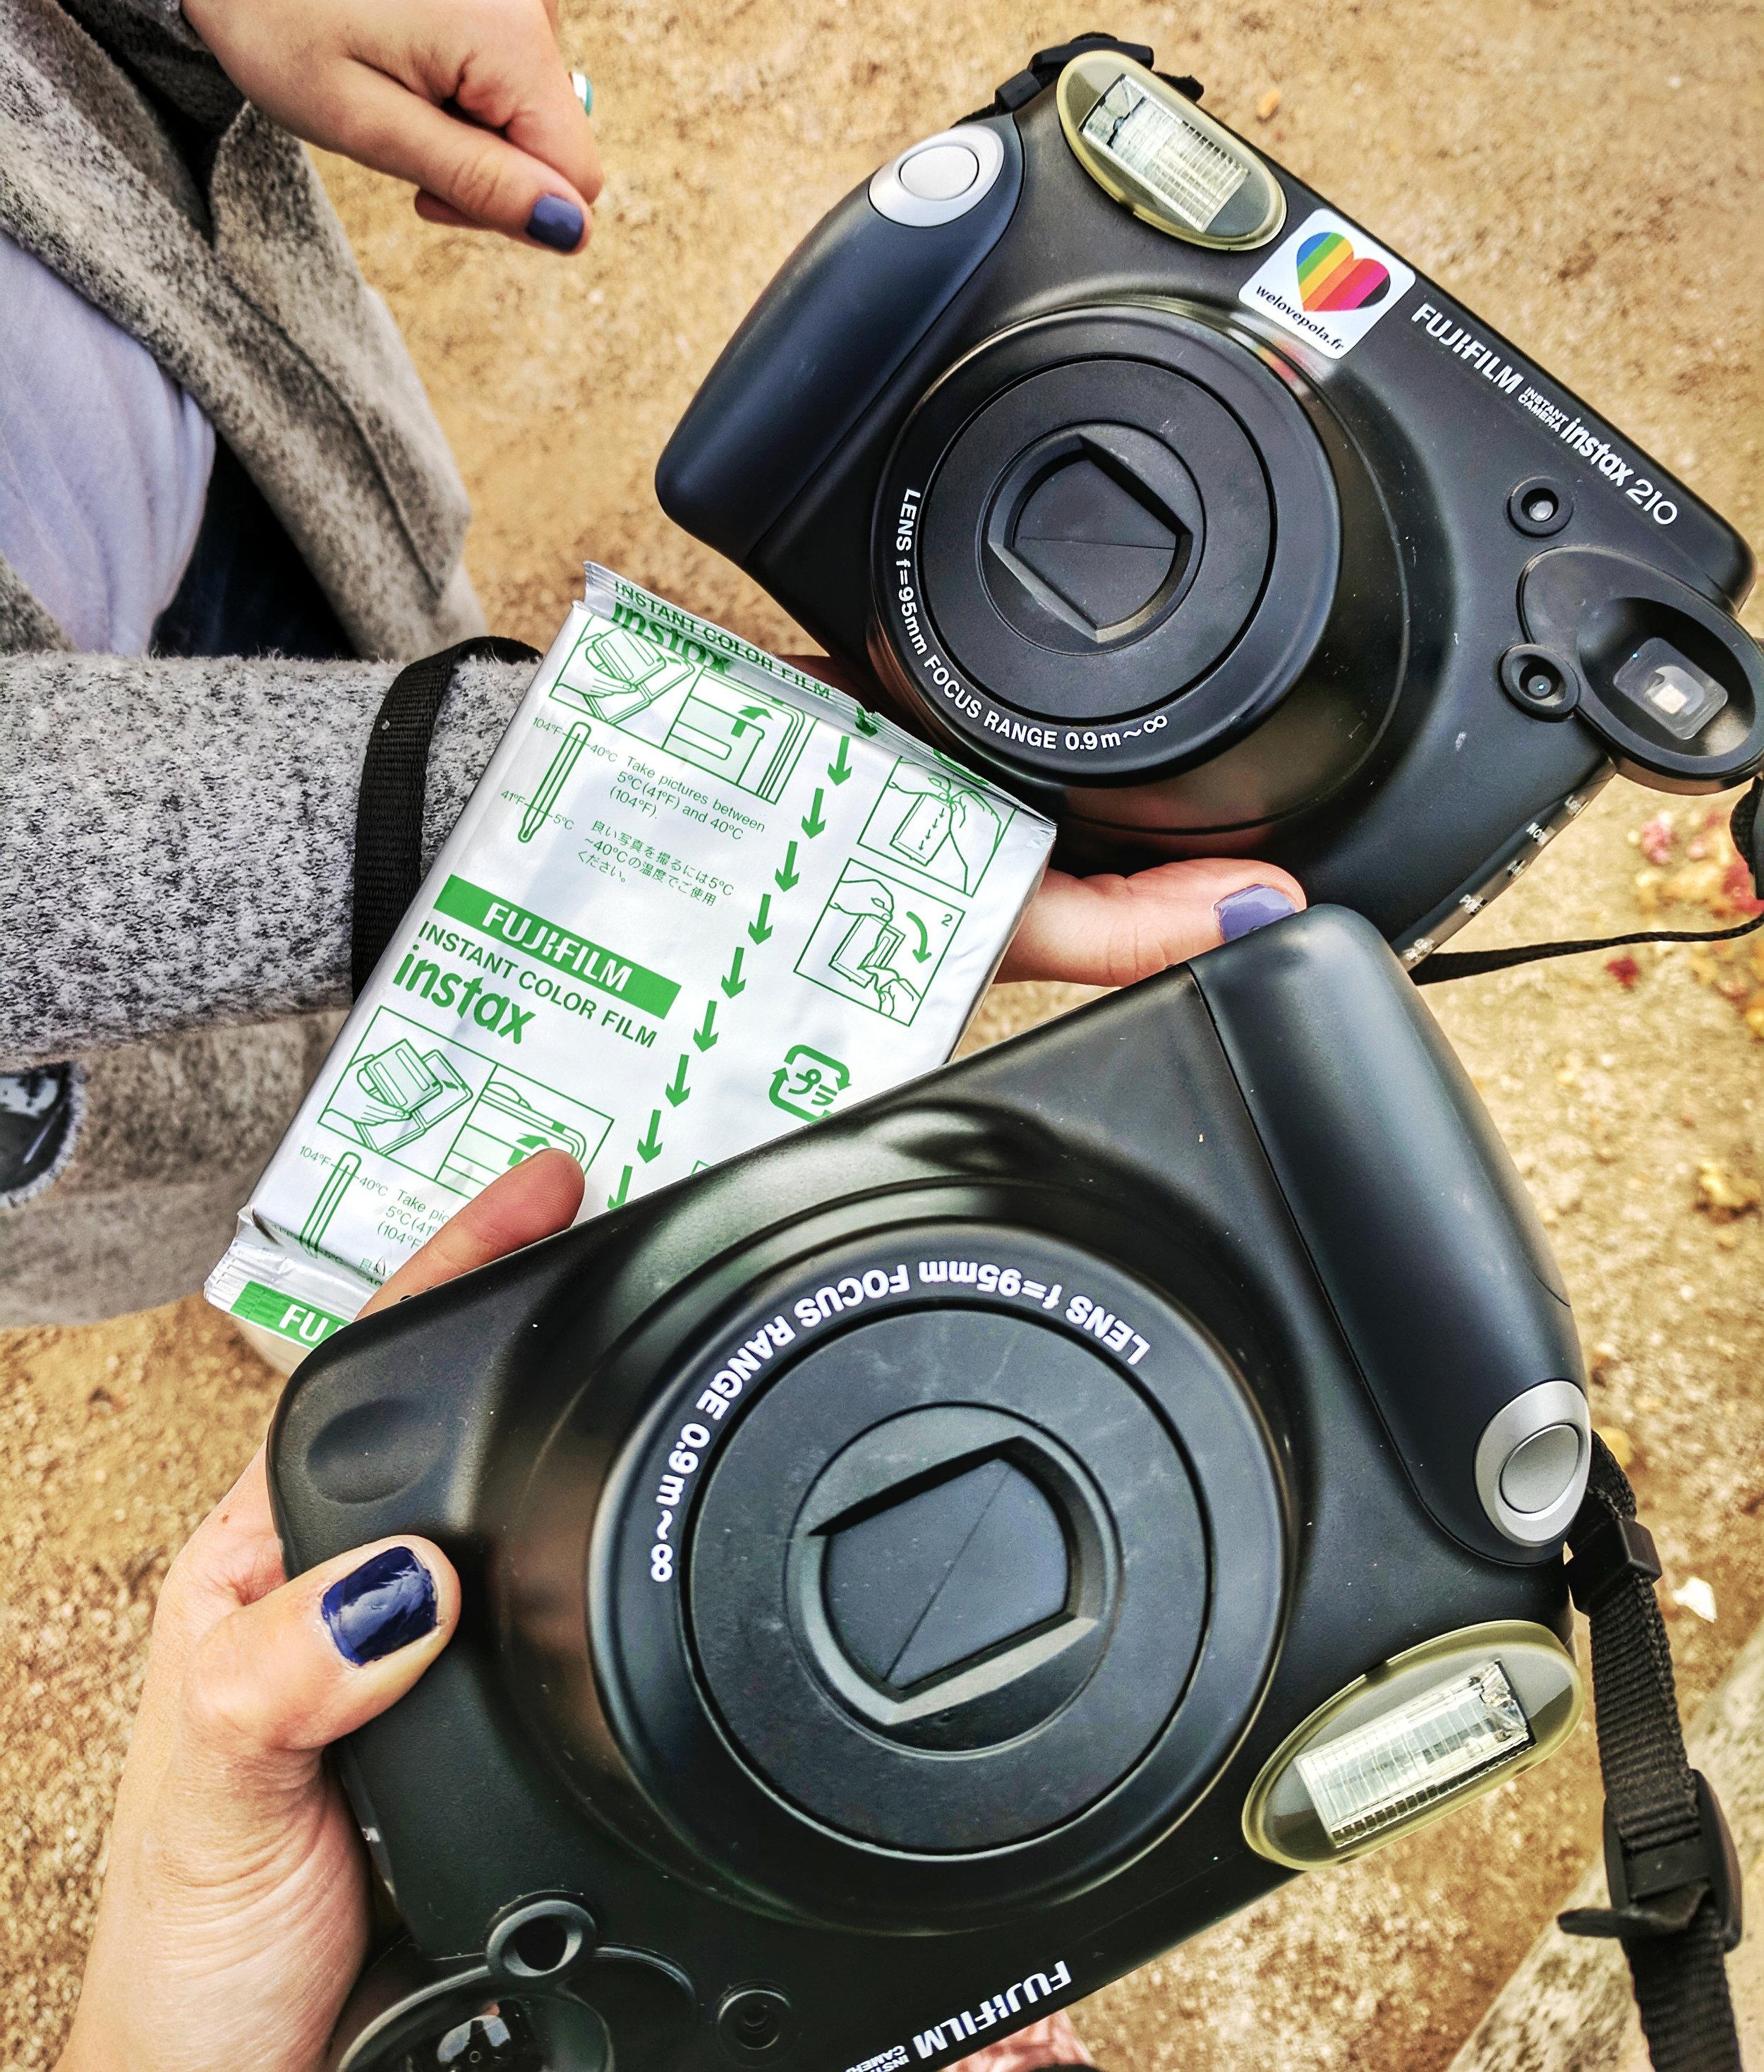 polaroid-cameras-and-film.jpg